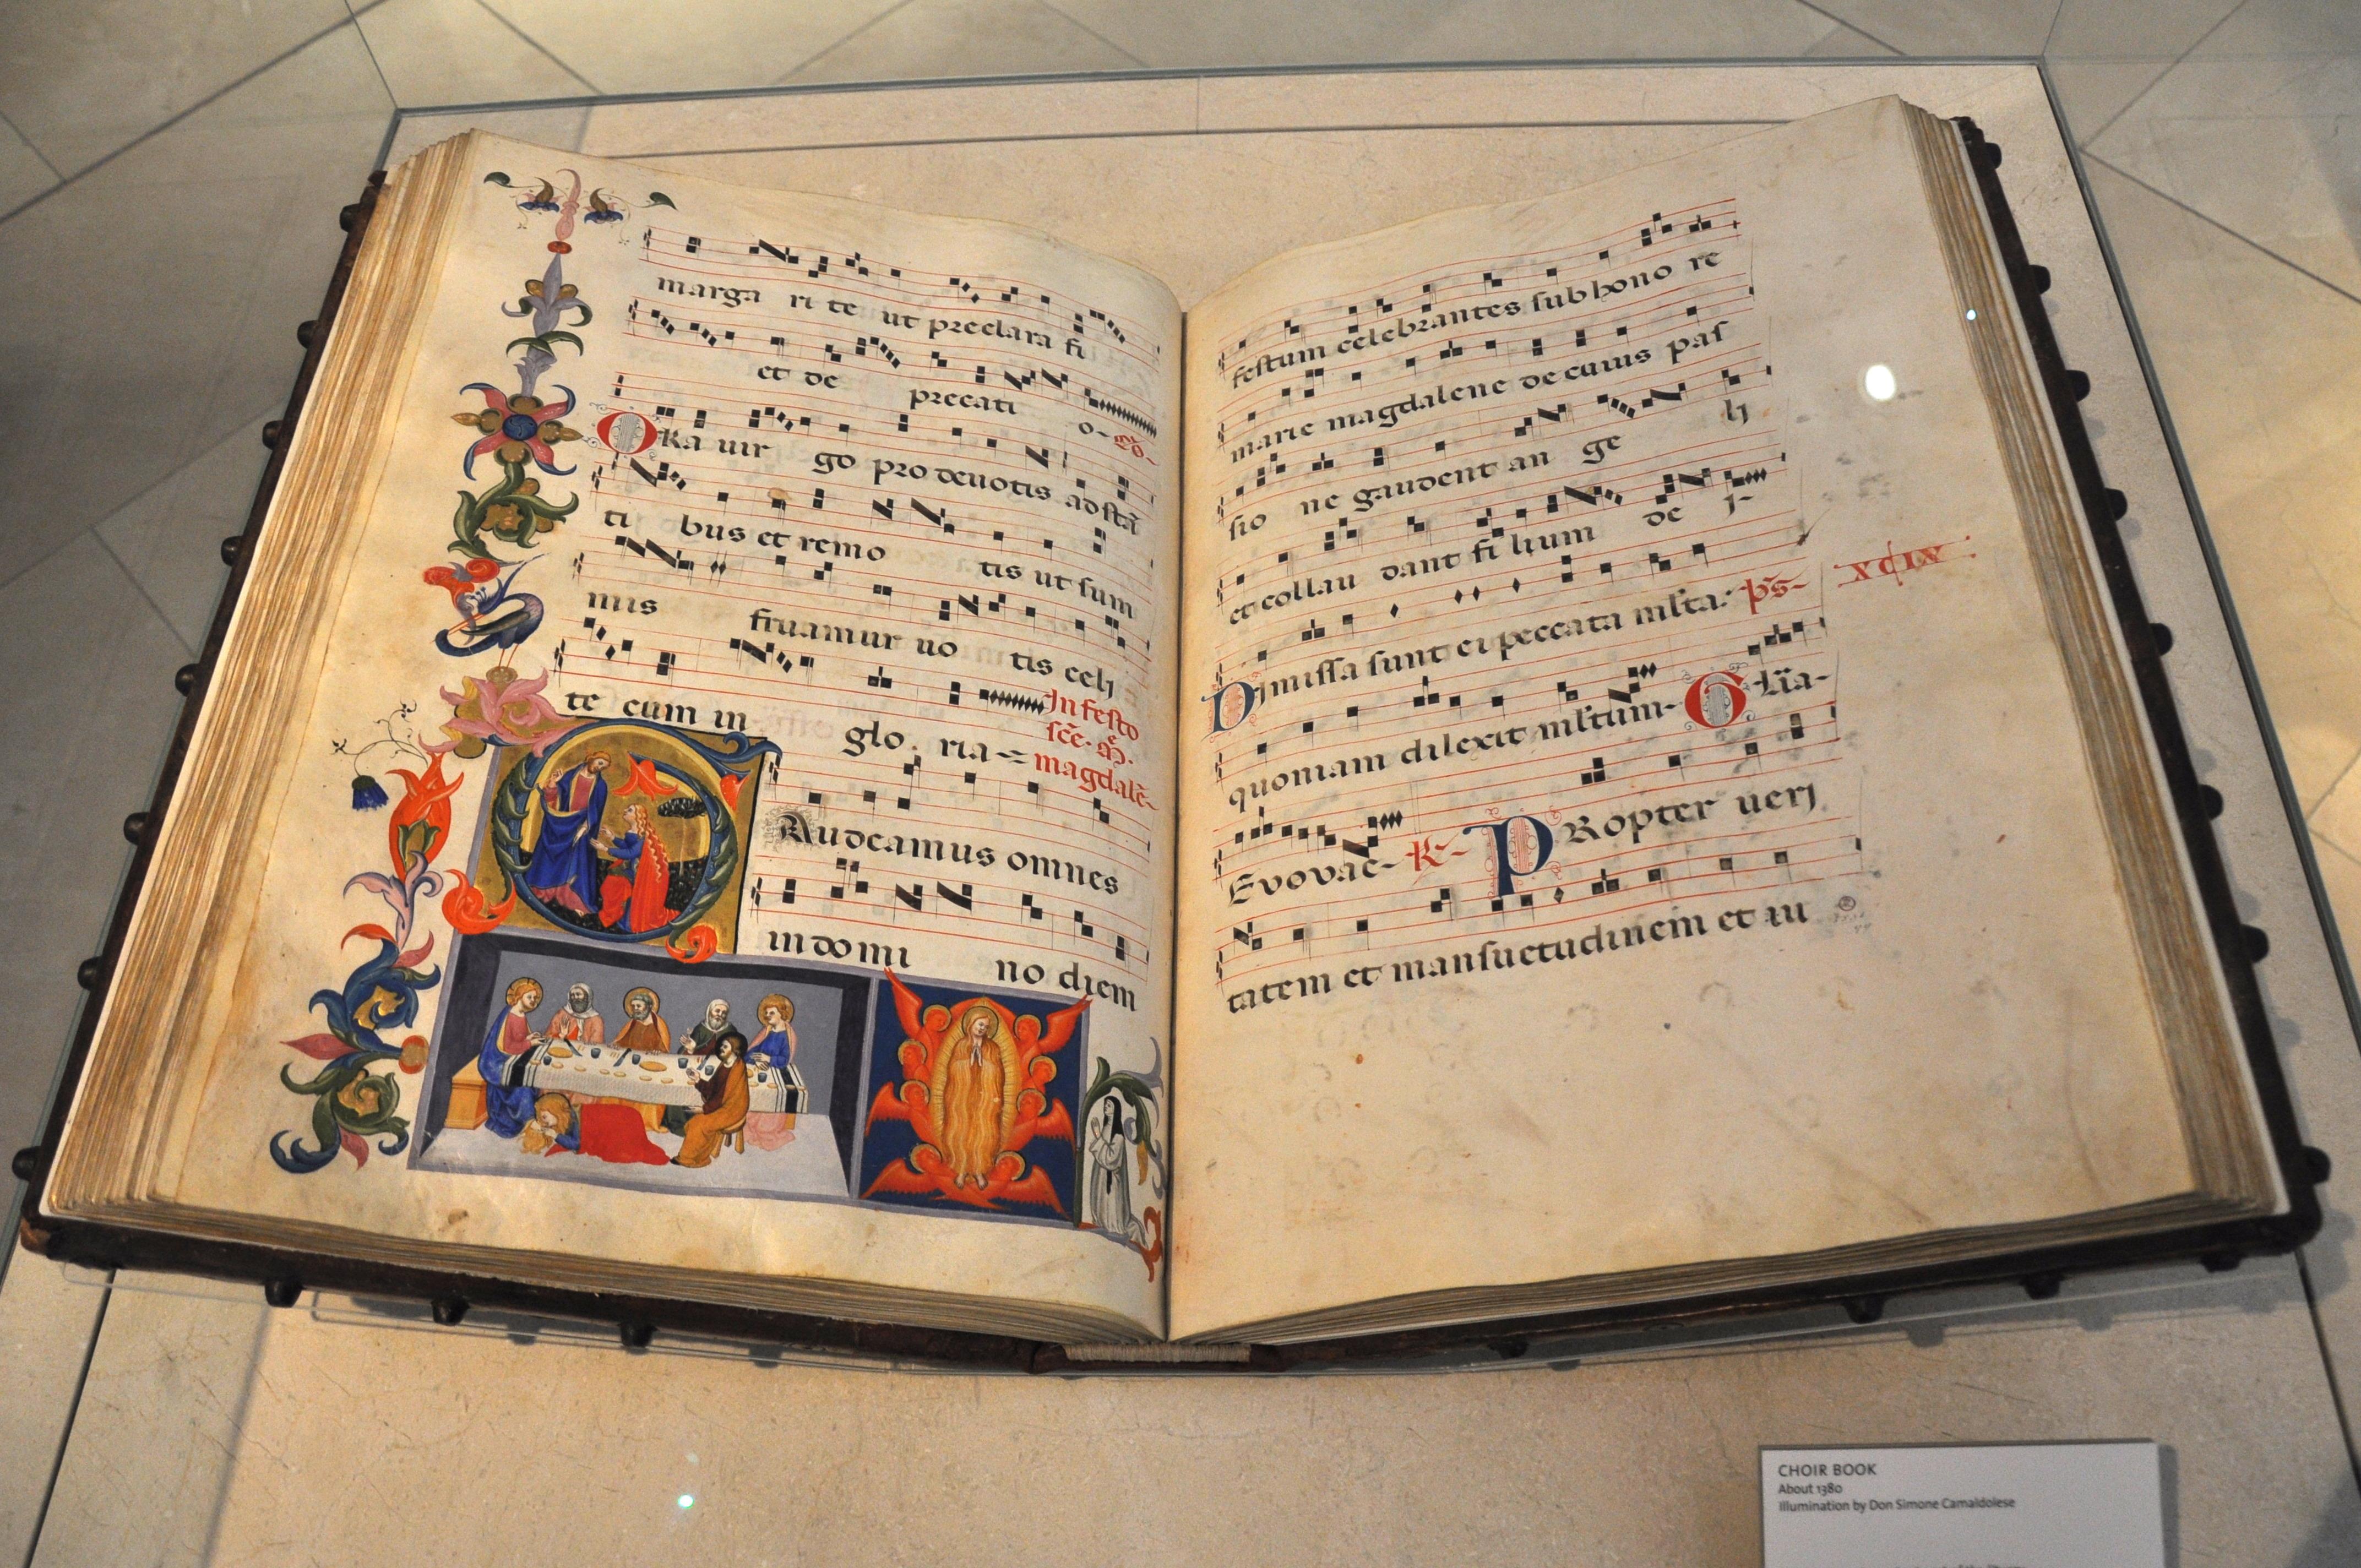 File:Chorbuch Florenz 1380 JPG - Wikimedia Commons